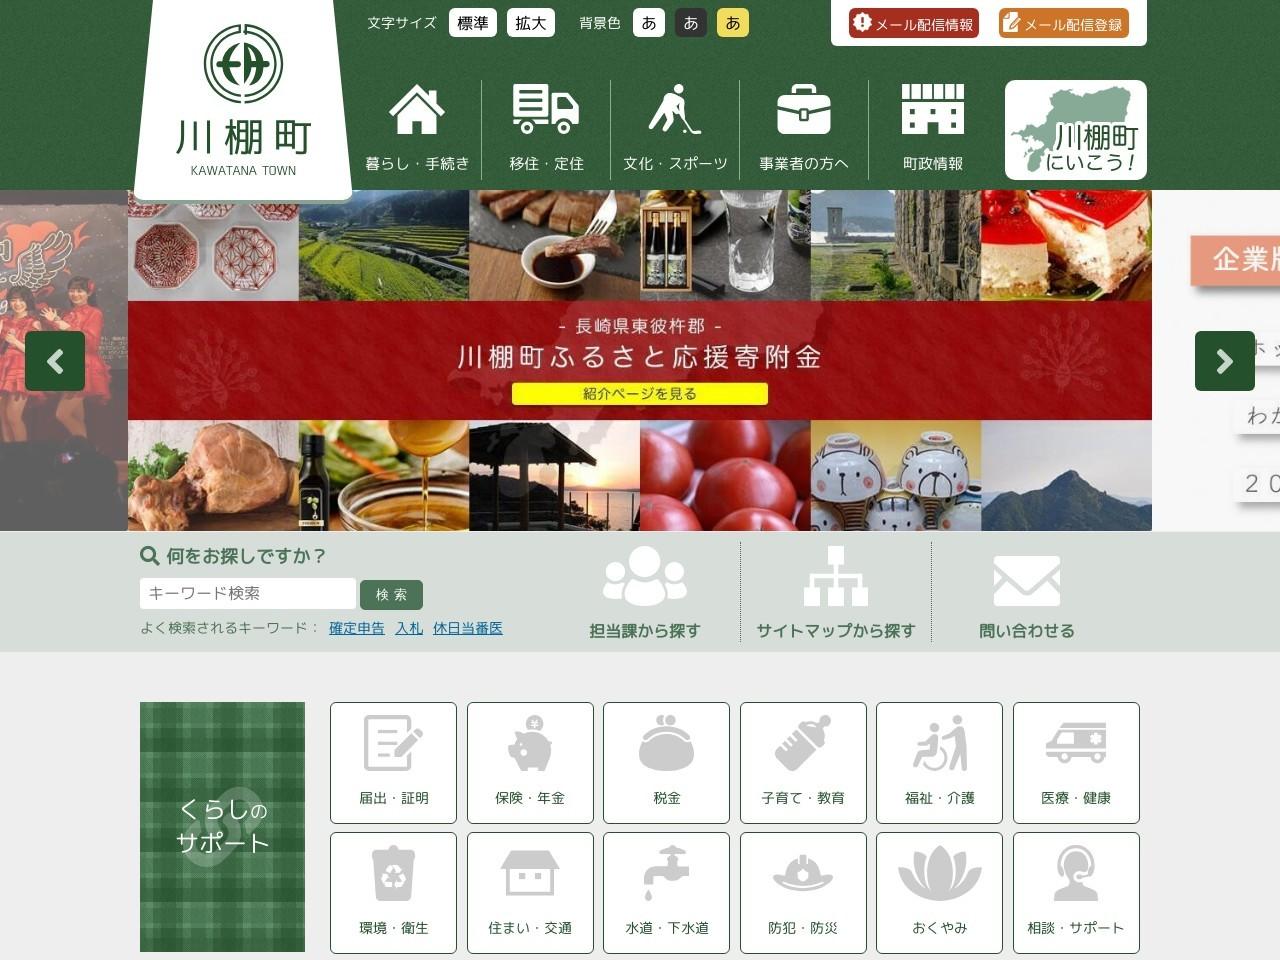 http://www.kawatana.jp/shiosai/hokouyoku/